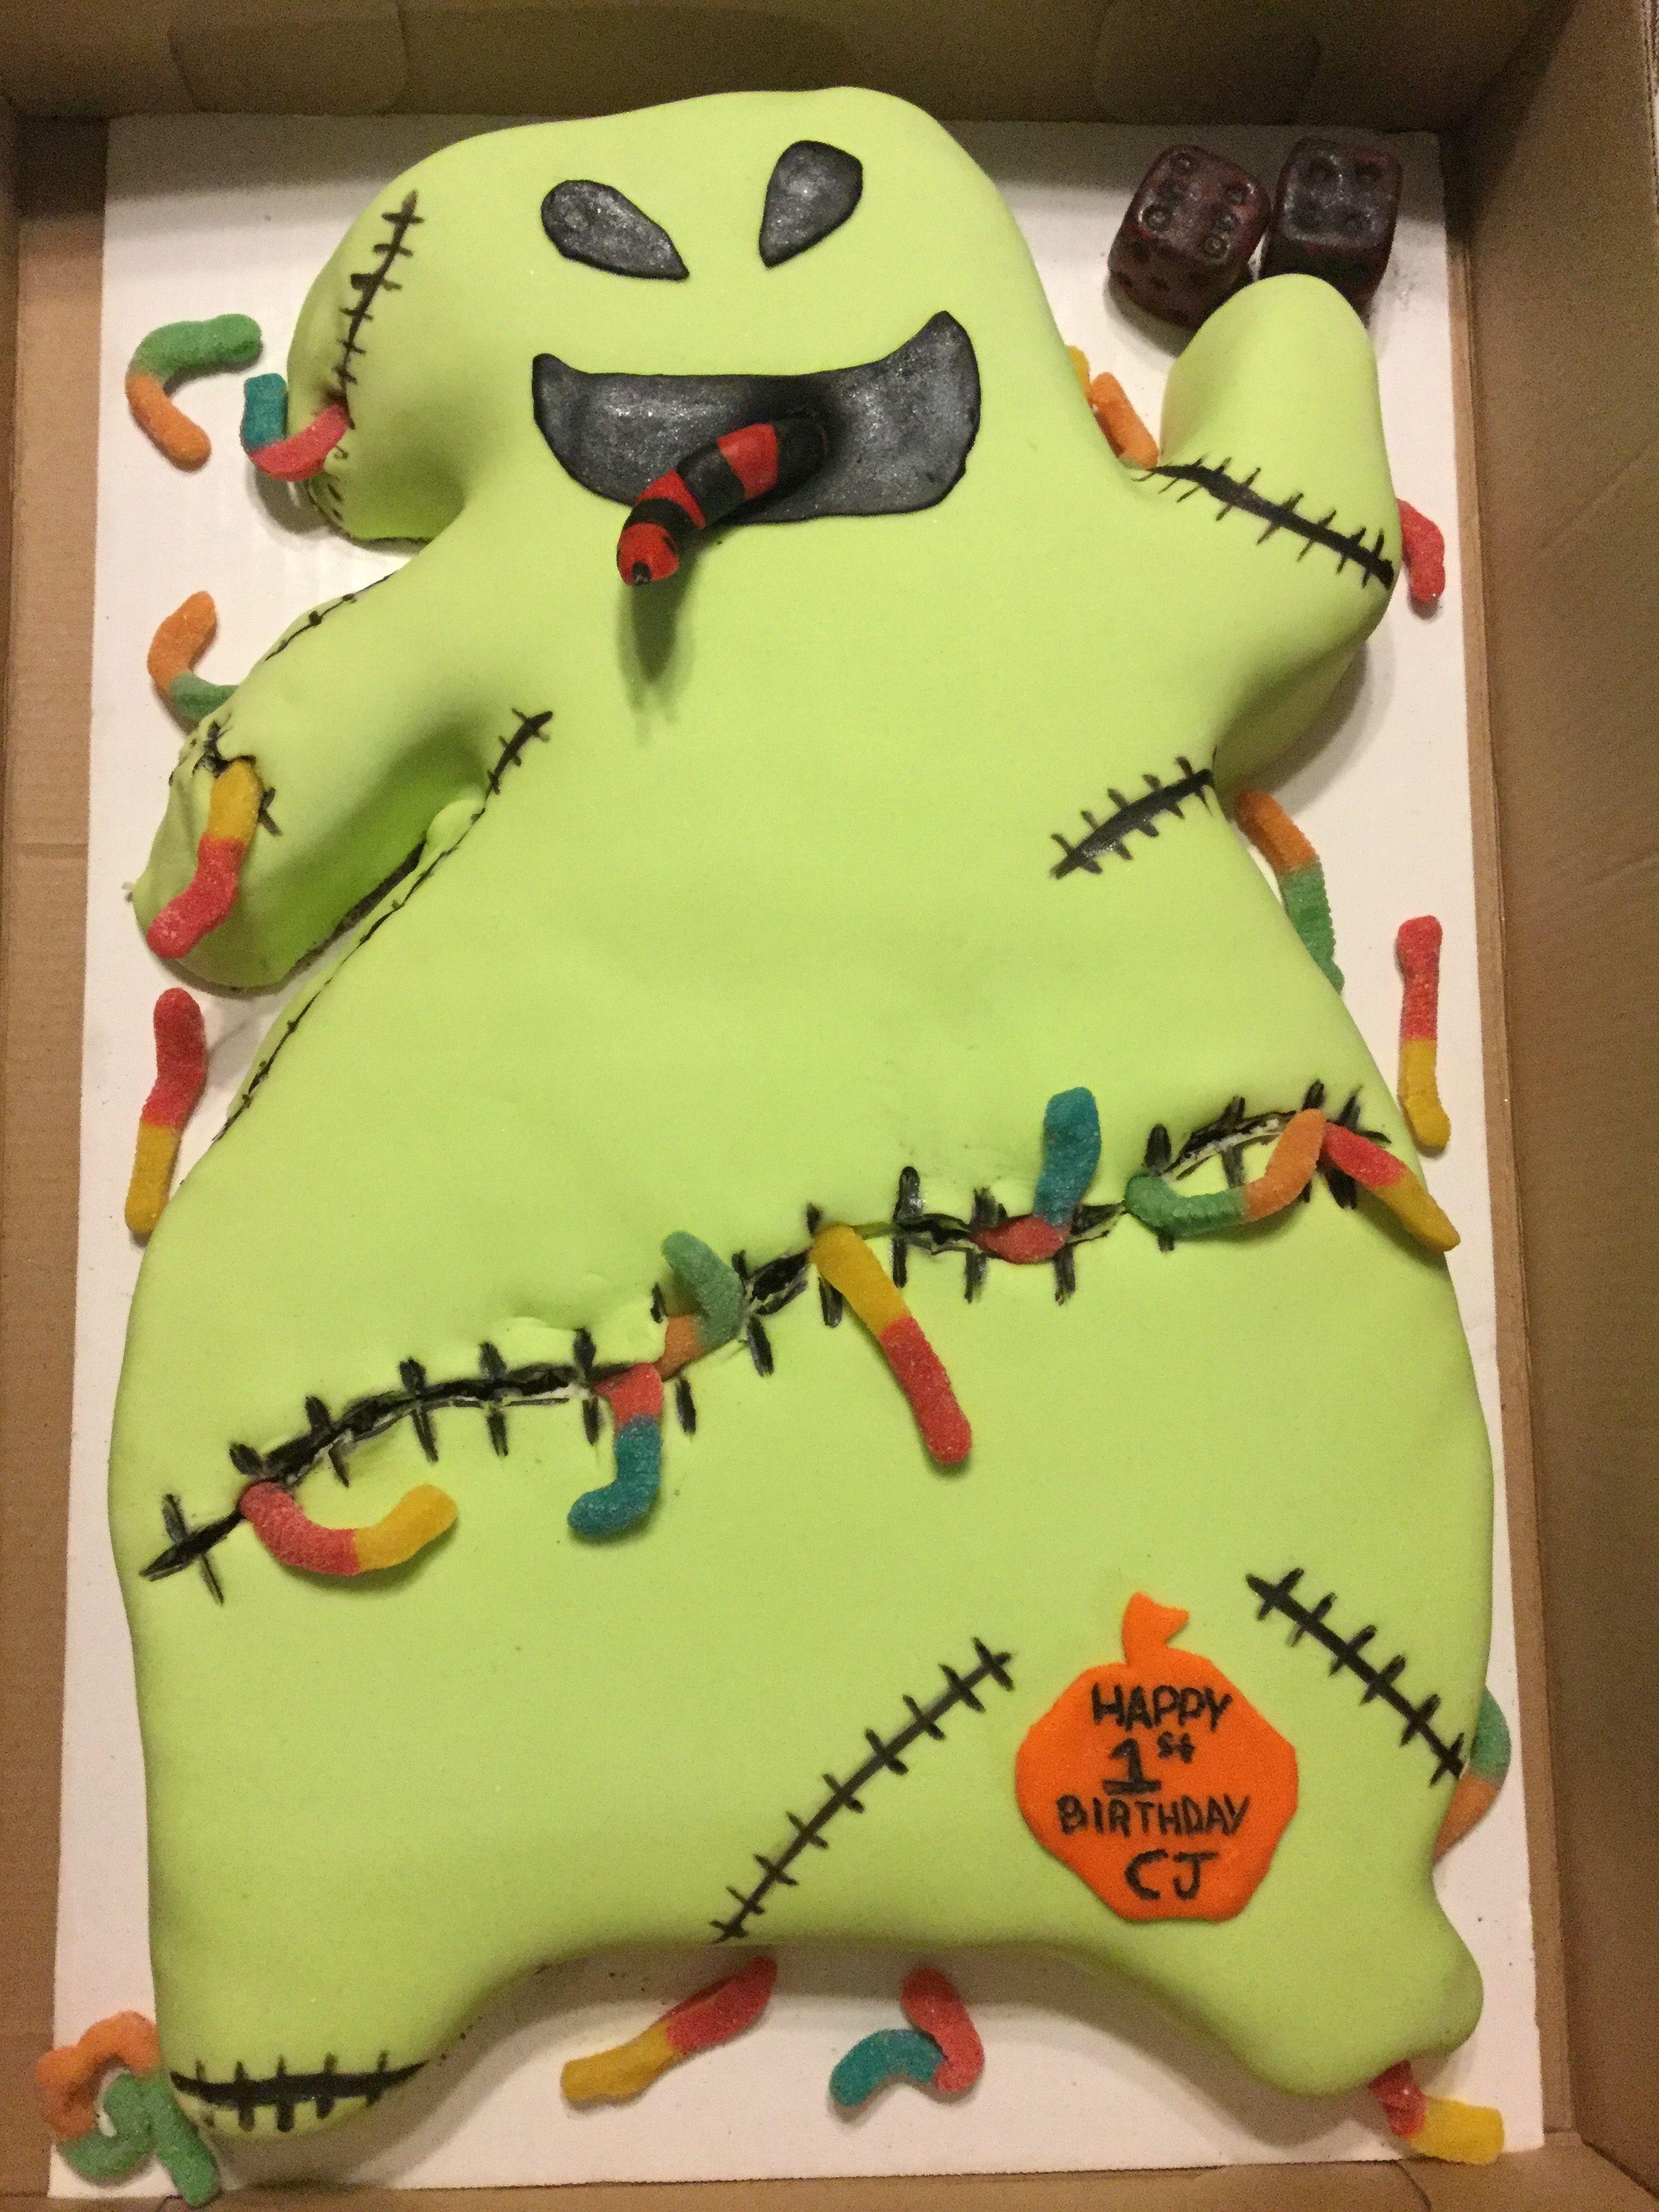 Oogie Boogie Birthday Cake From Nightmare Before Christmas